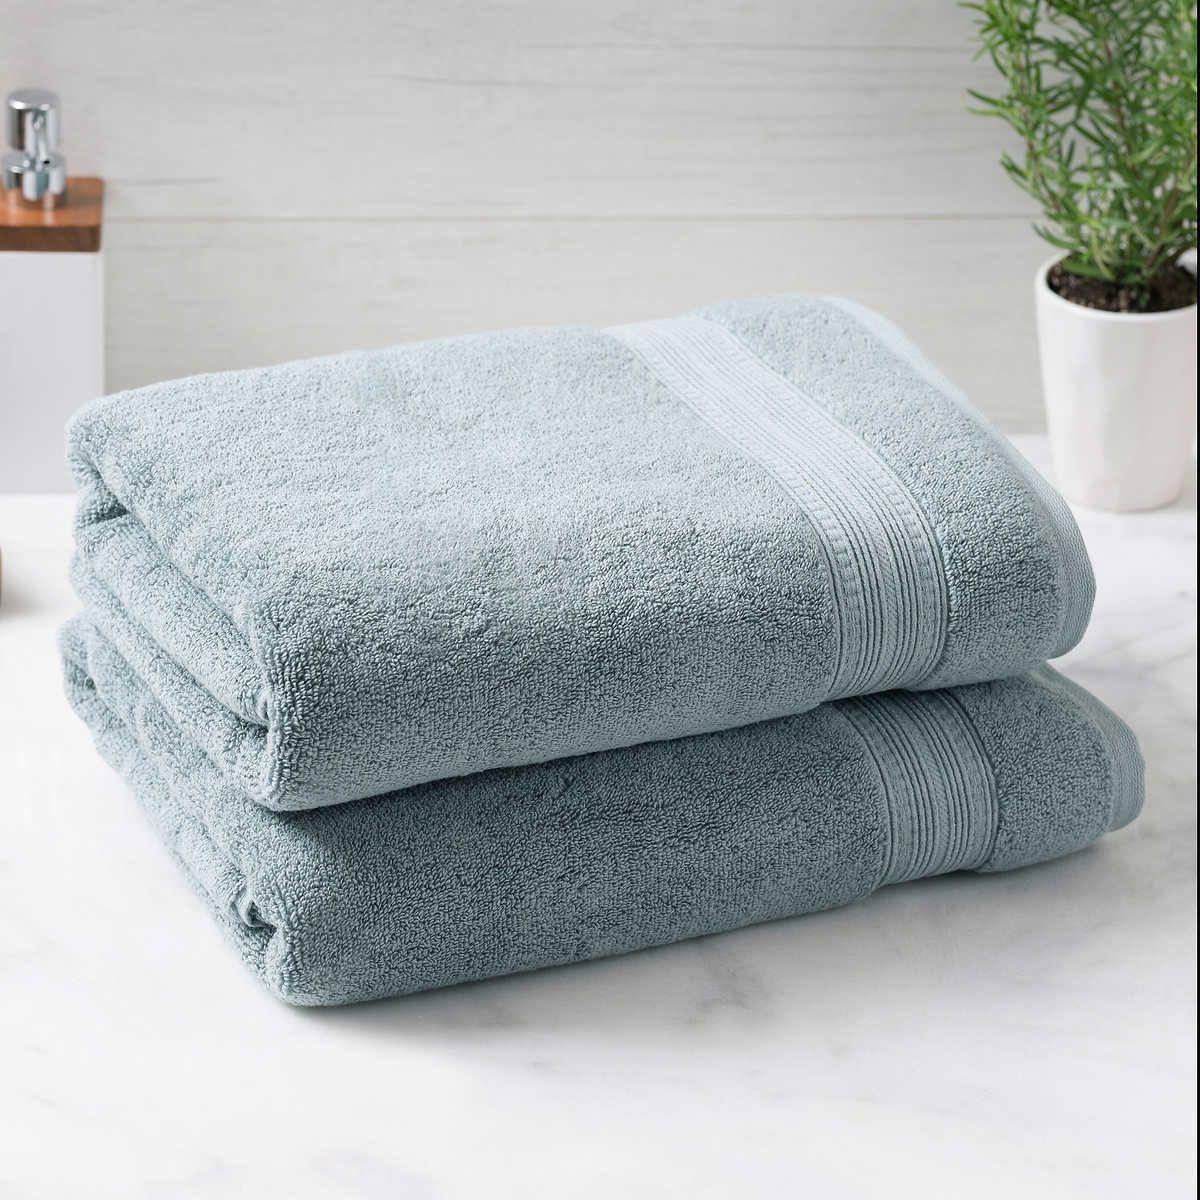 Charisma Soft 100 Hygro Cotton 2 Piece Bath Towel Set Bathroom